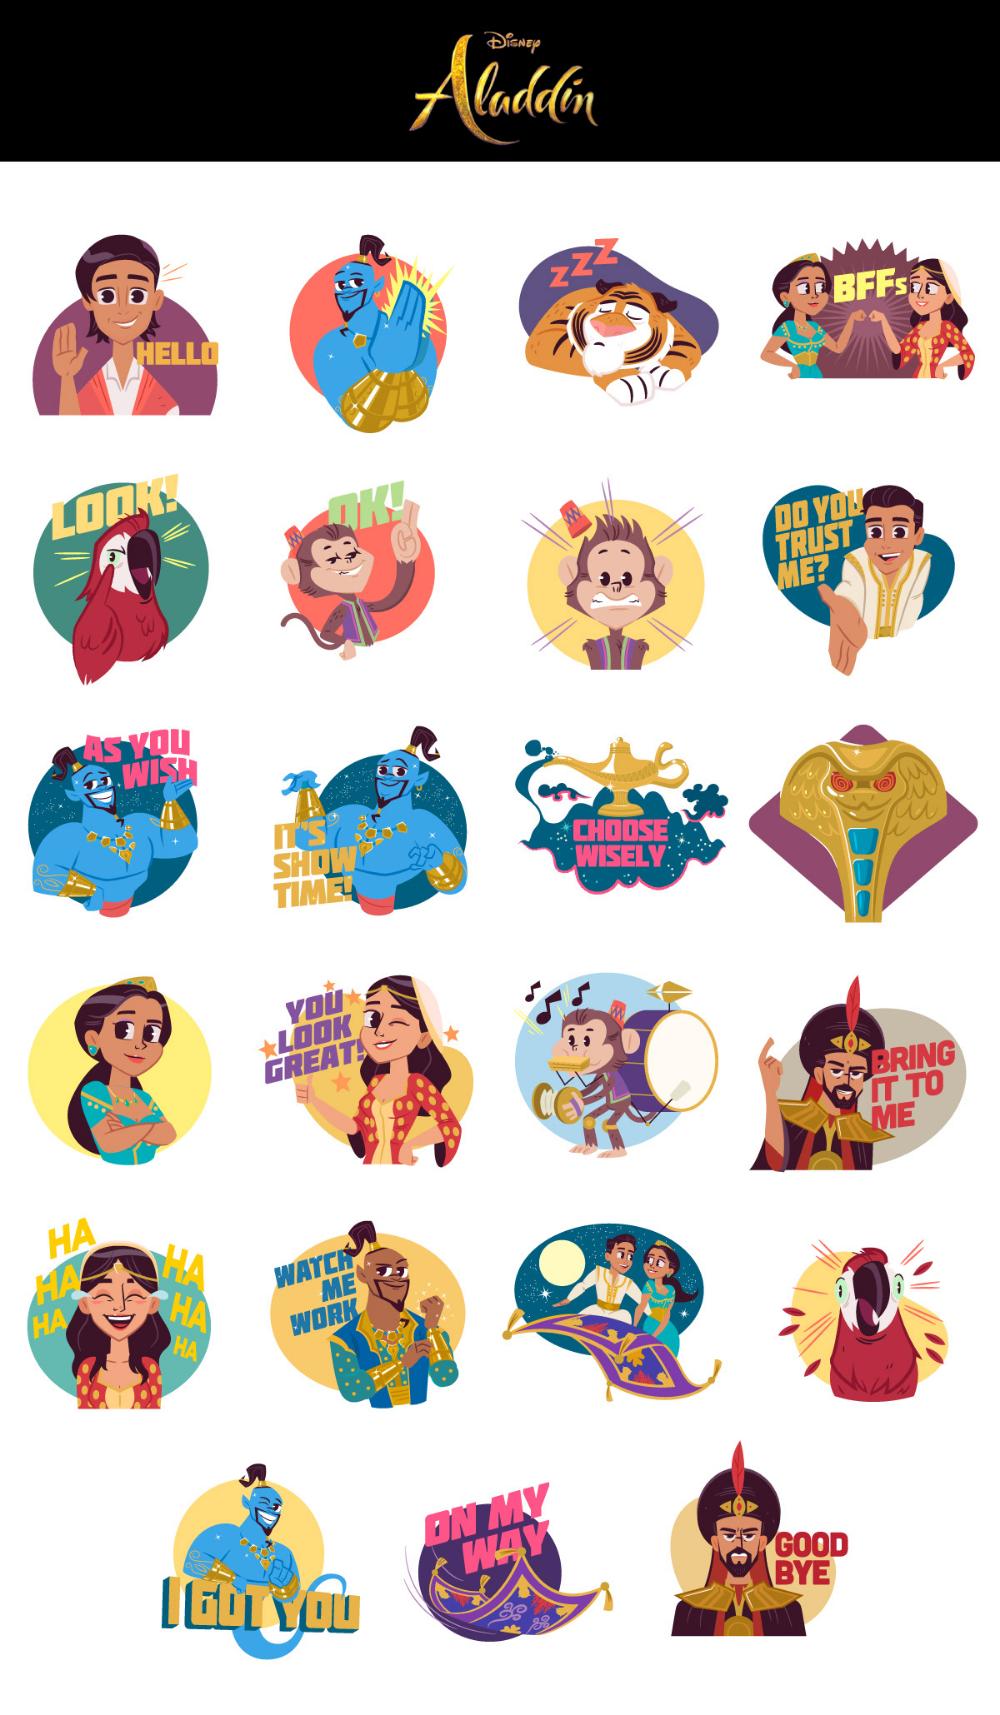 Disney Aladdin Ios Stickers On Behance Disney Sticker Cinderella Sticker Disney Aladdin